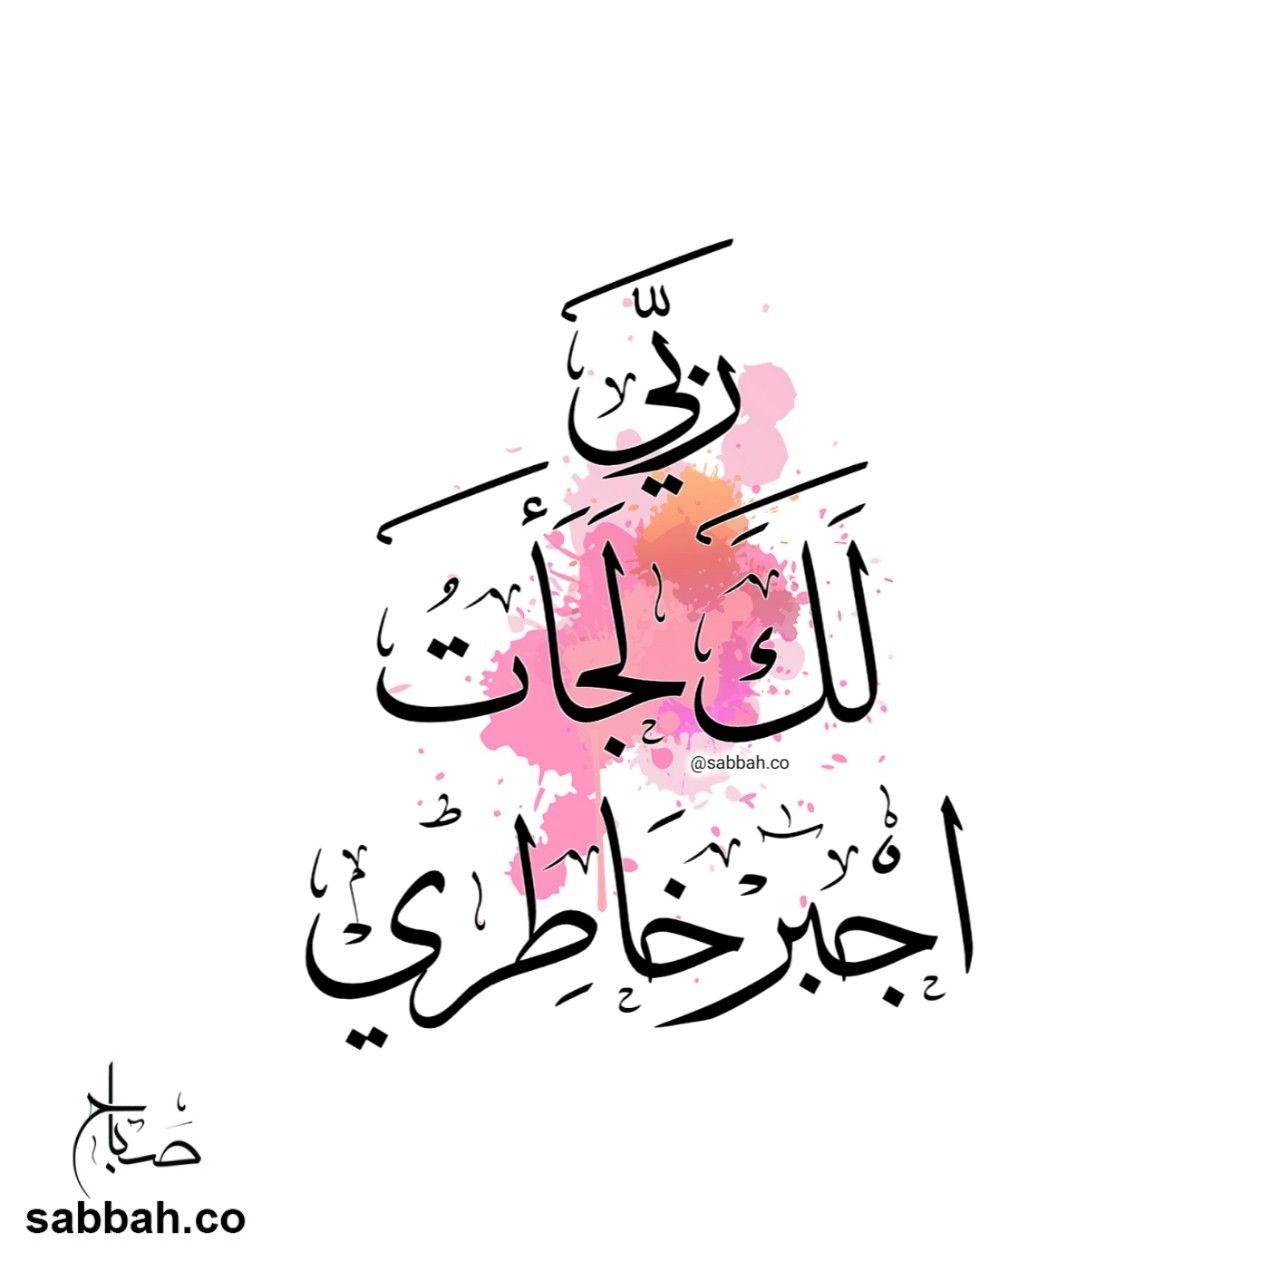 ربي لك لجأت اجبر خاطري Follow My Instagram Sabbah Co Www Sabbah Co دعاء اذ Arabic Quotes Islamic Inspirational Quotes Islamic Quotes Wallpaper